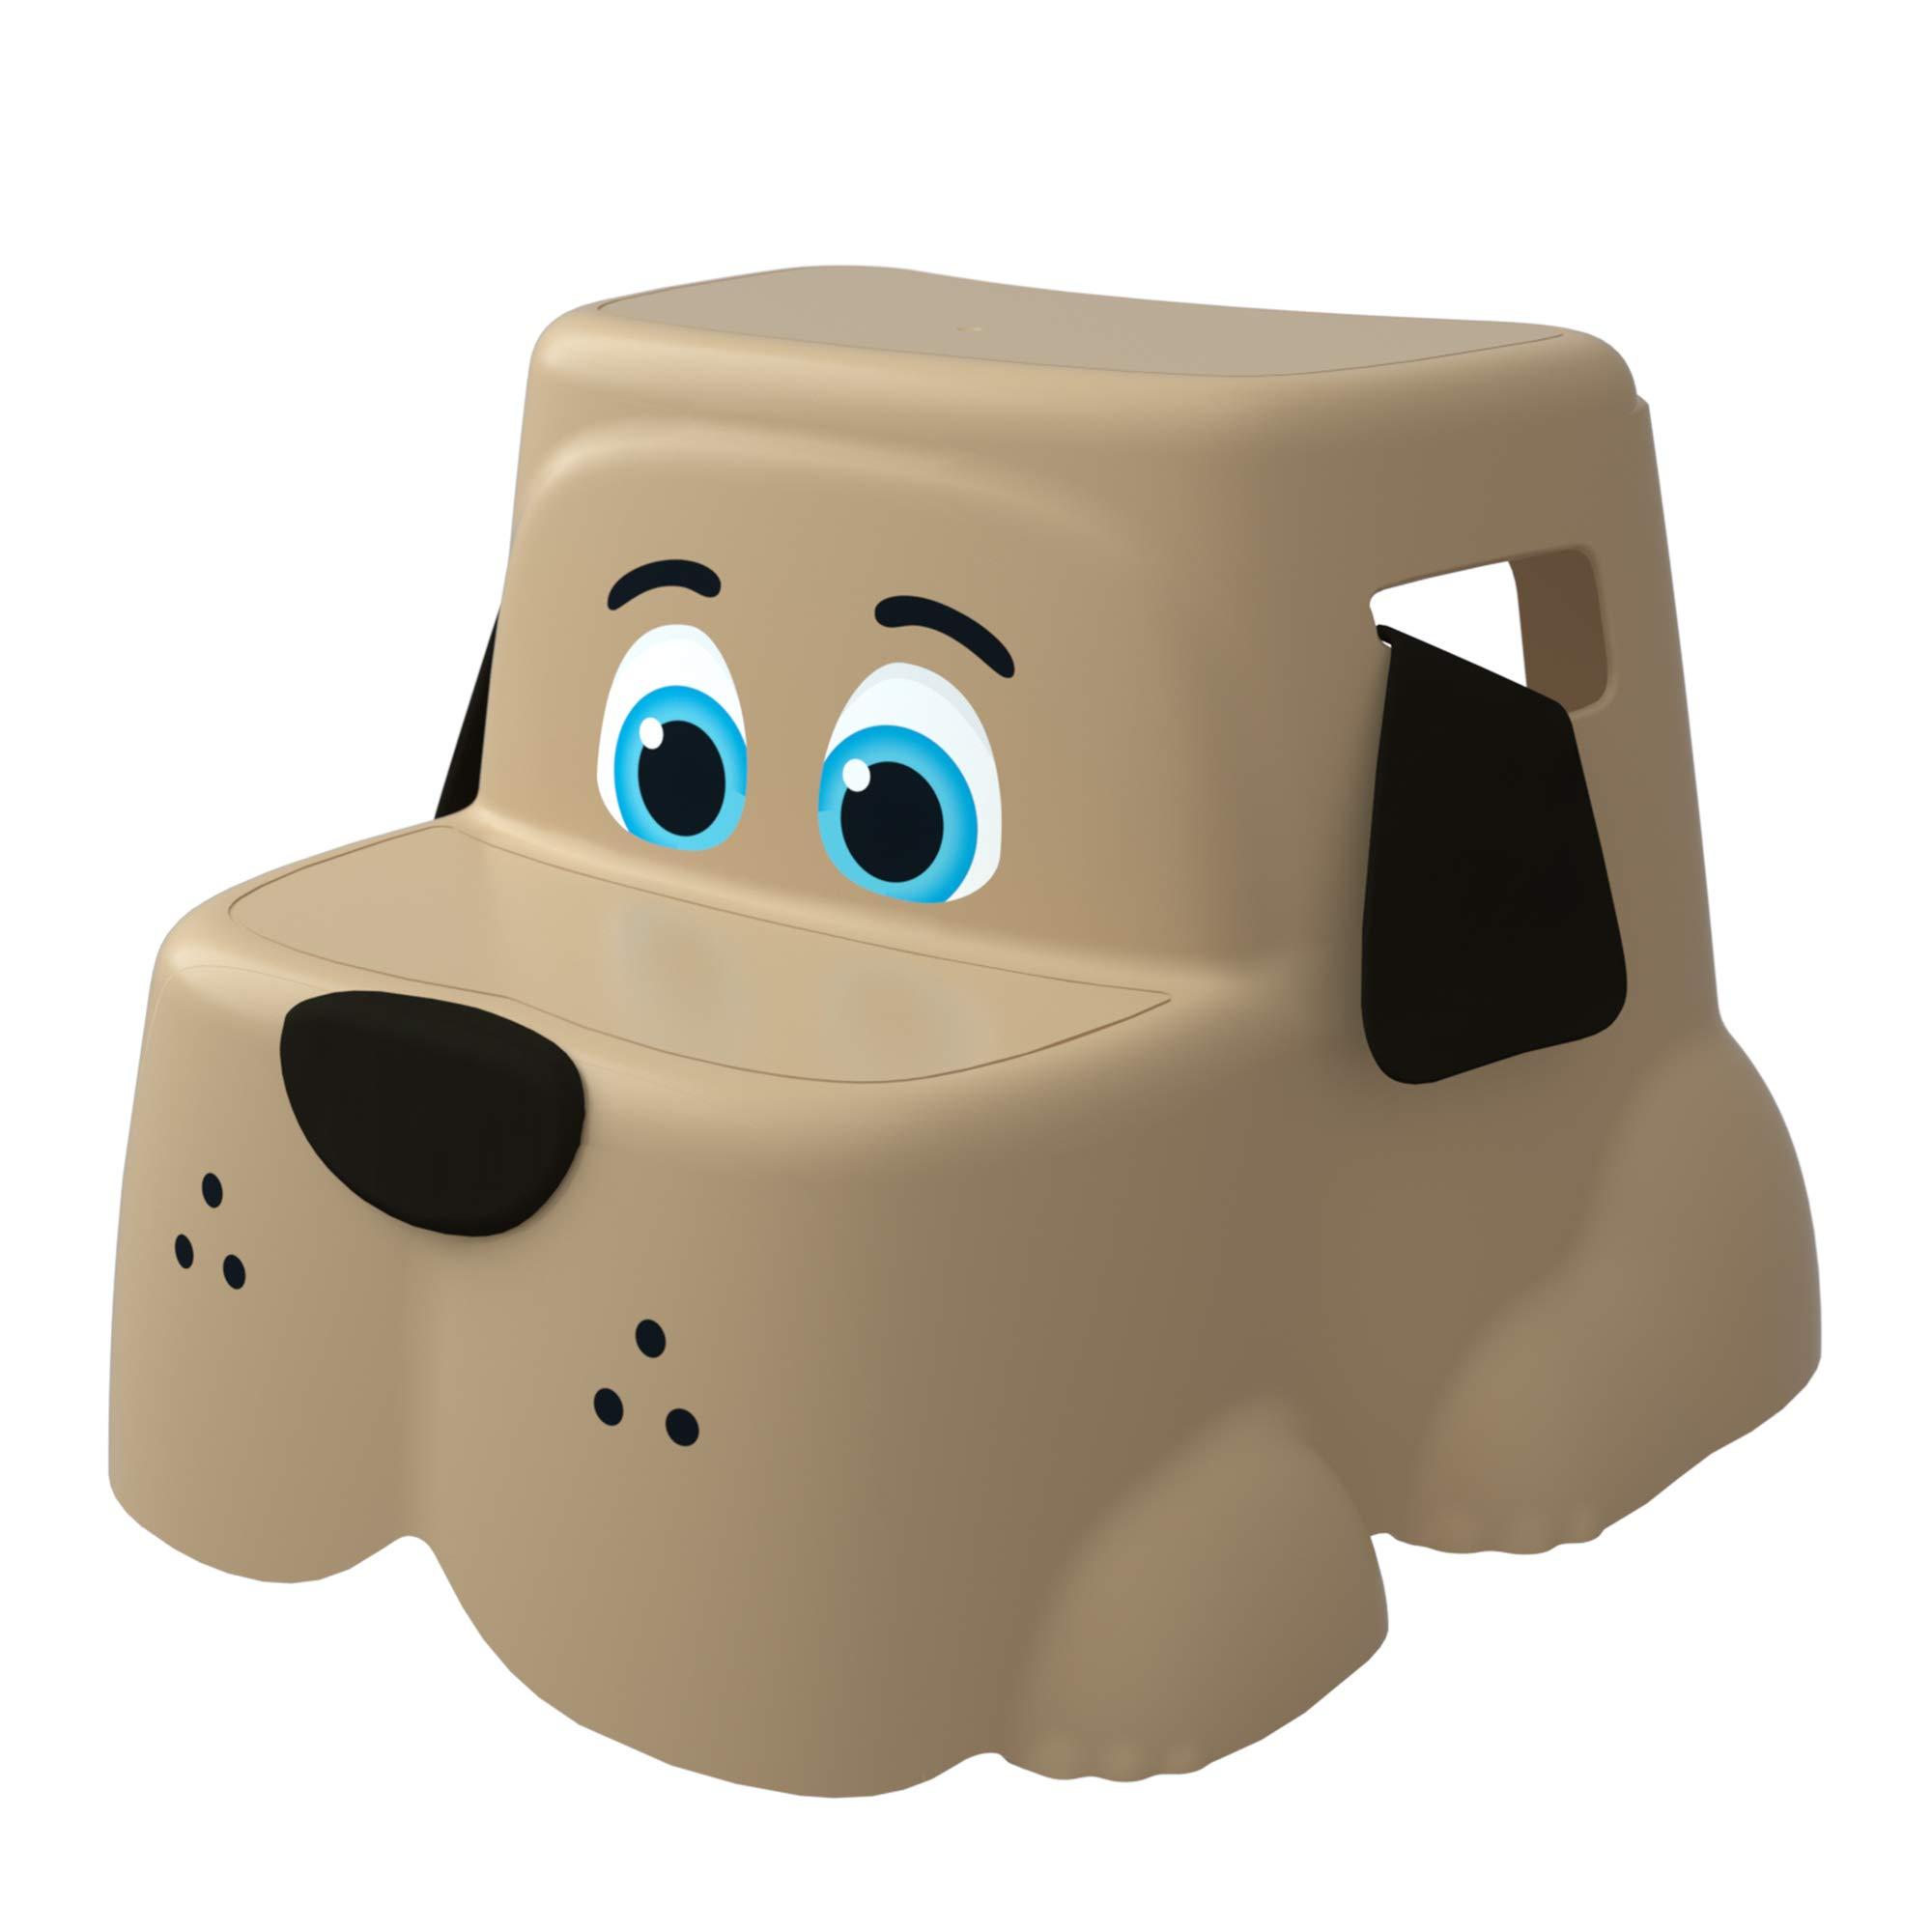 Squatty Potty The Original Toilet Stool, Kids Potty Pet''Pup'' Base Multi-Purpose Training Stool